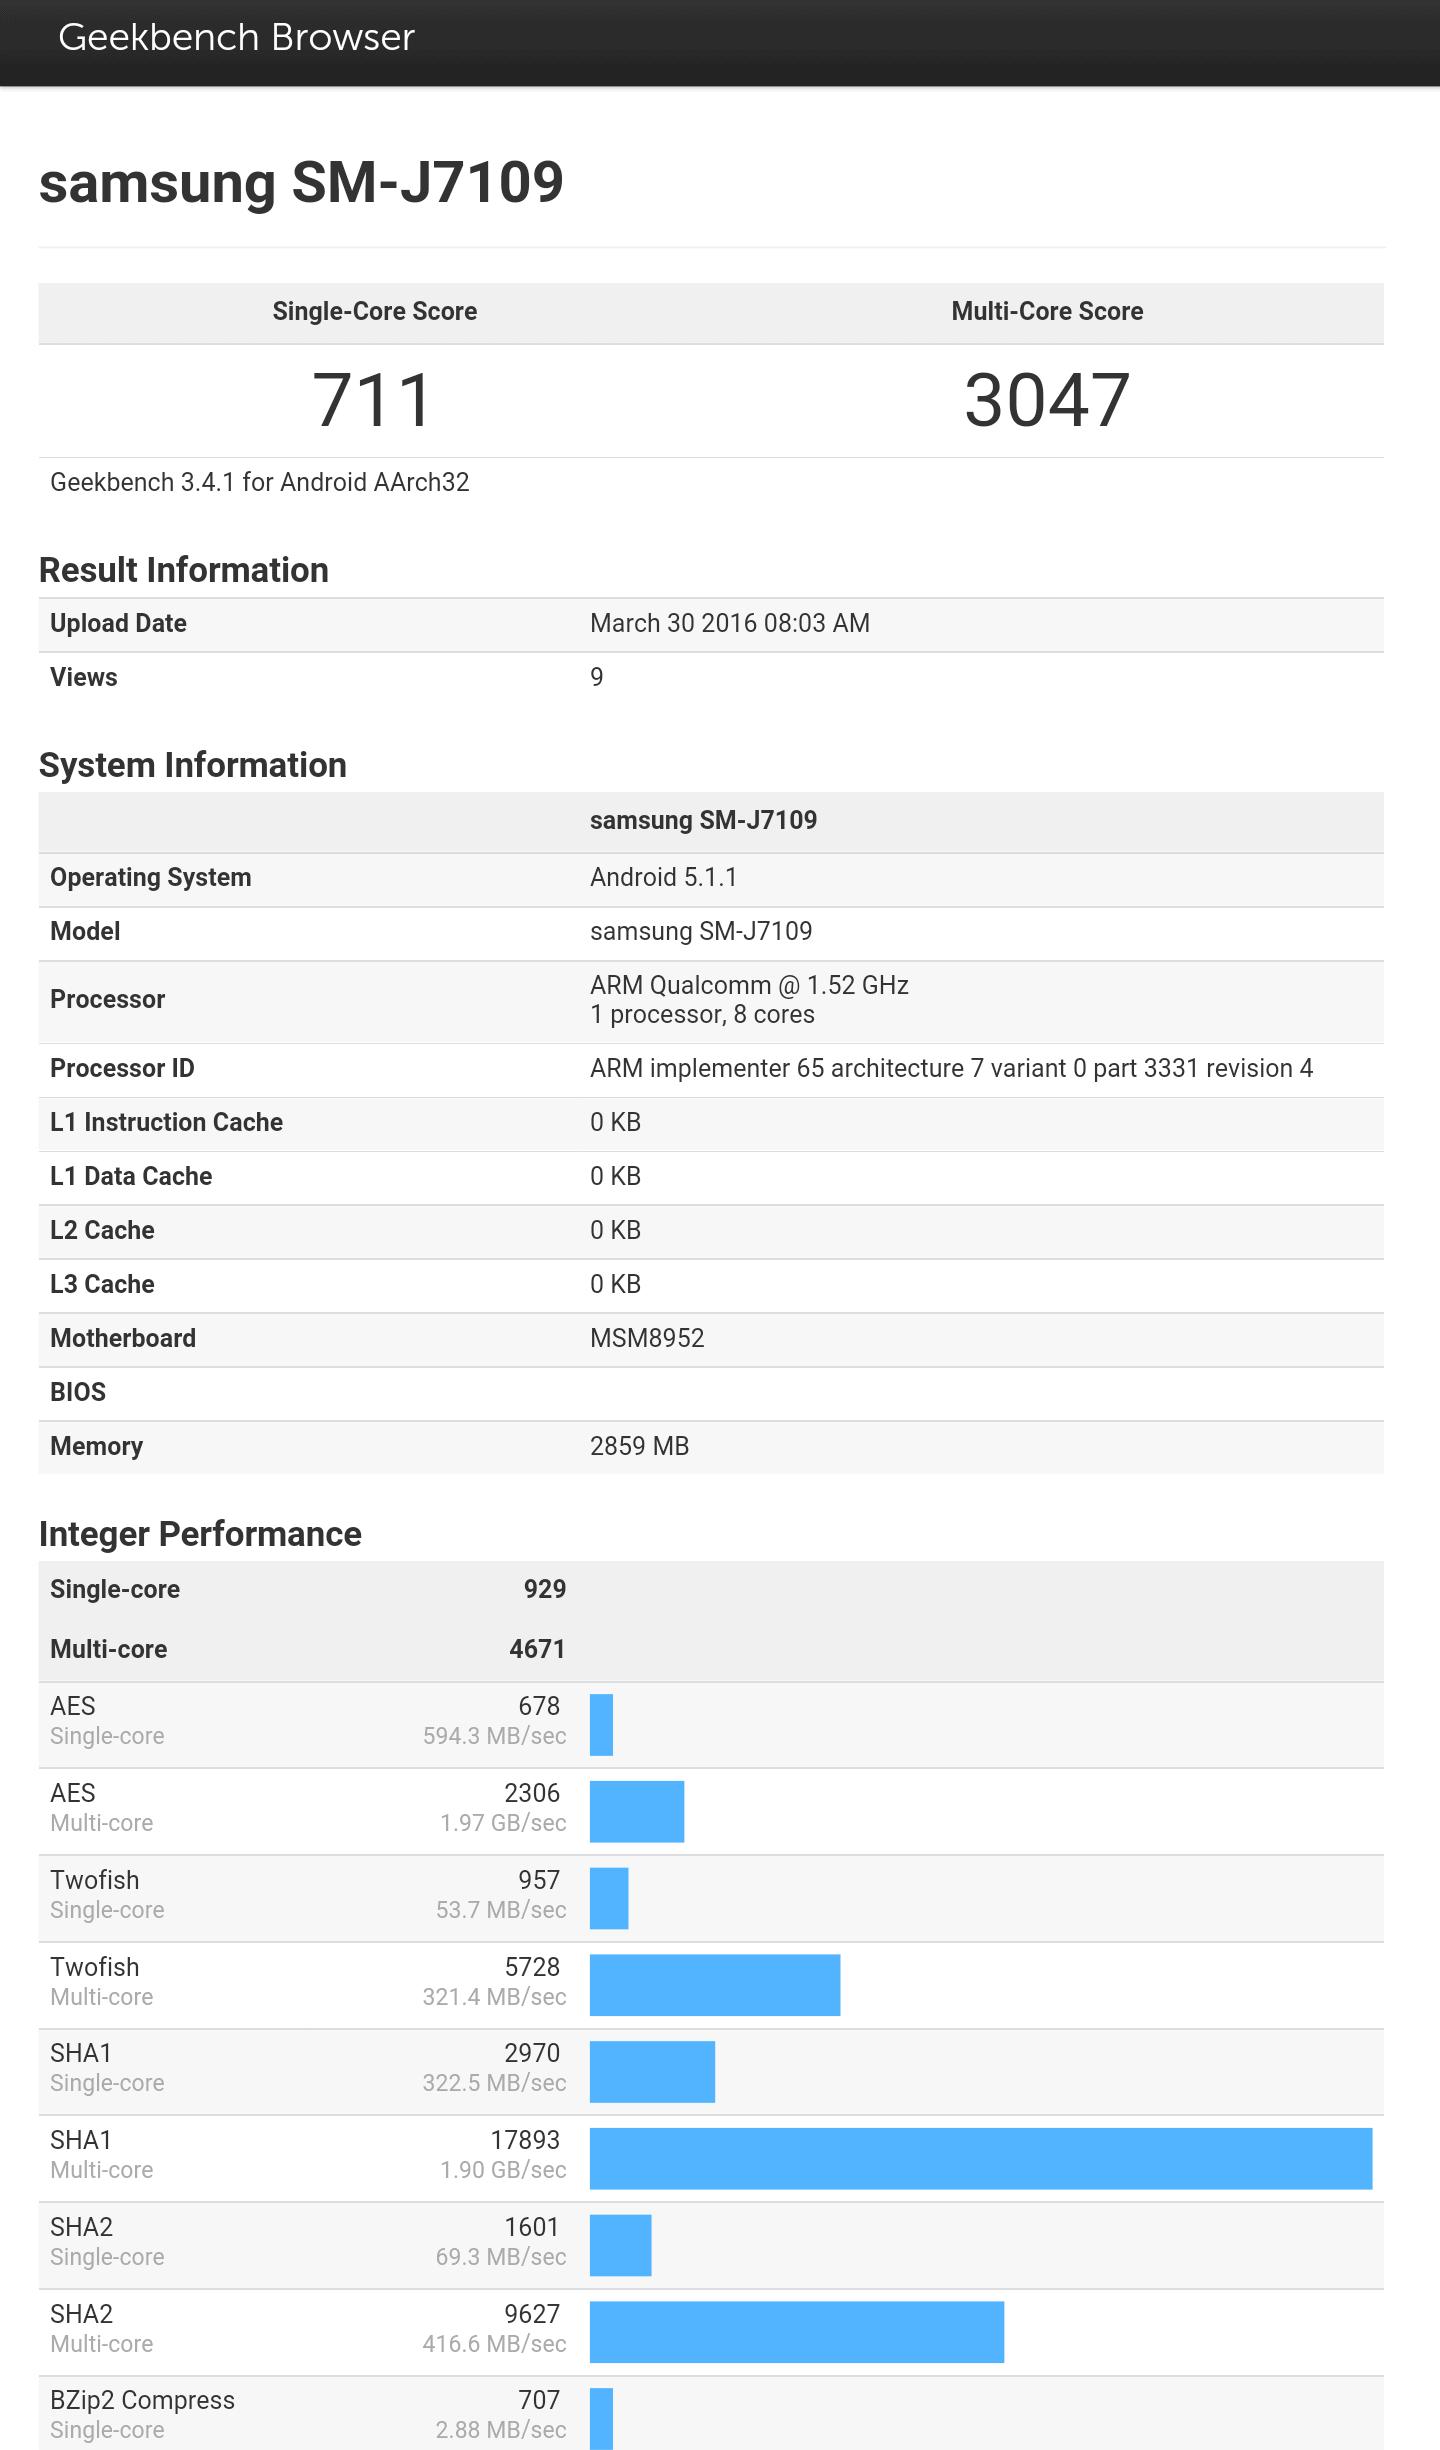 Galaxy J7 snapdragon variant benchmark